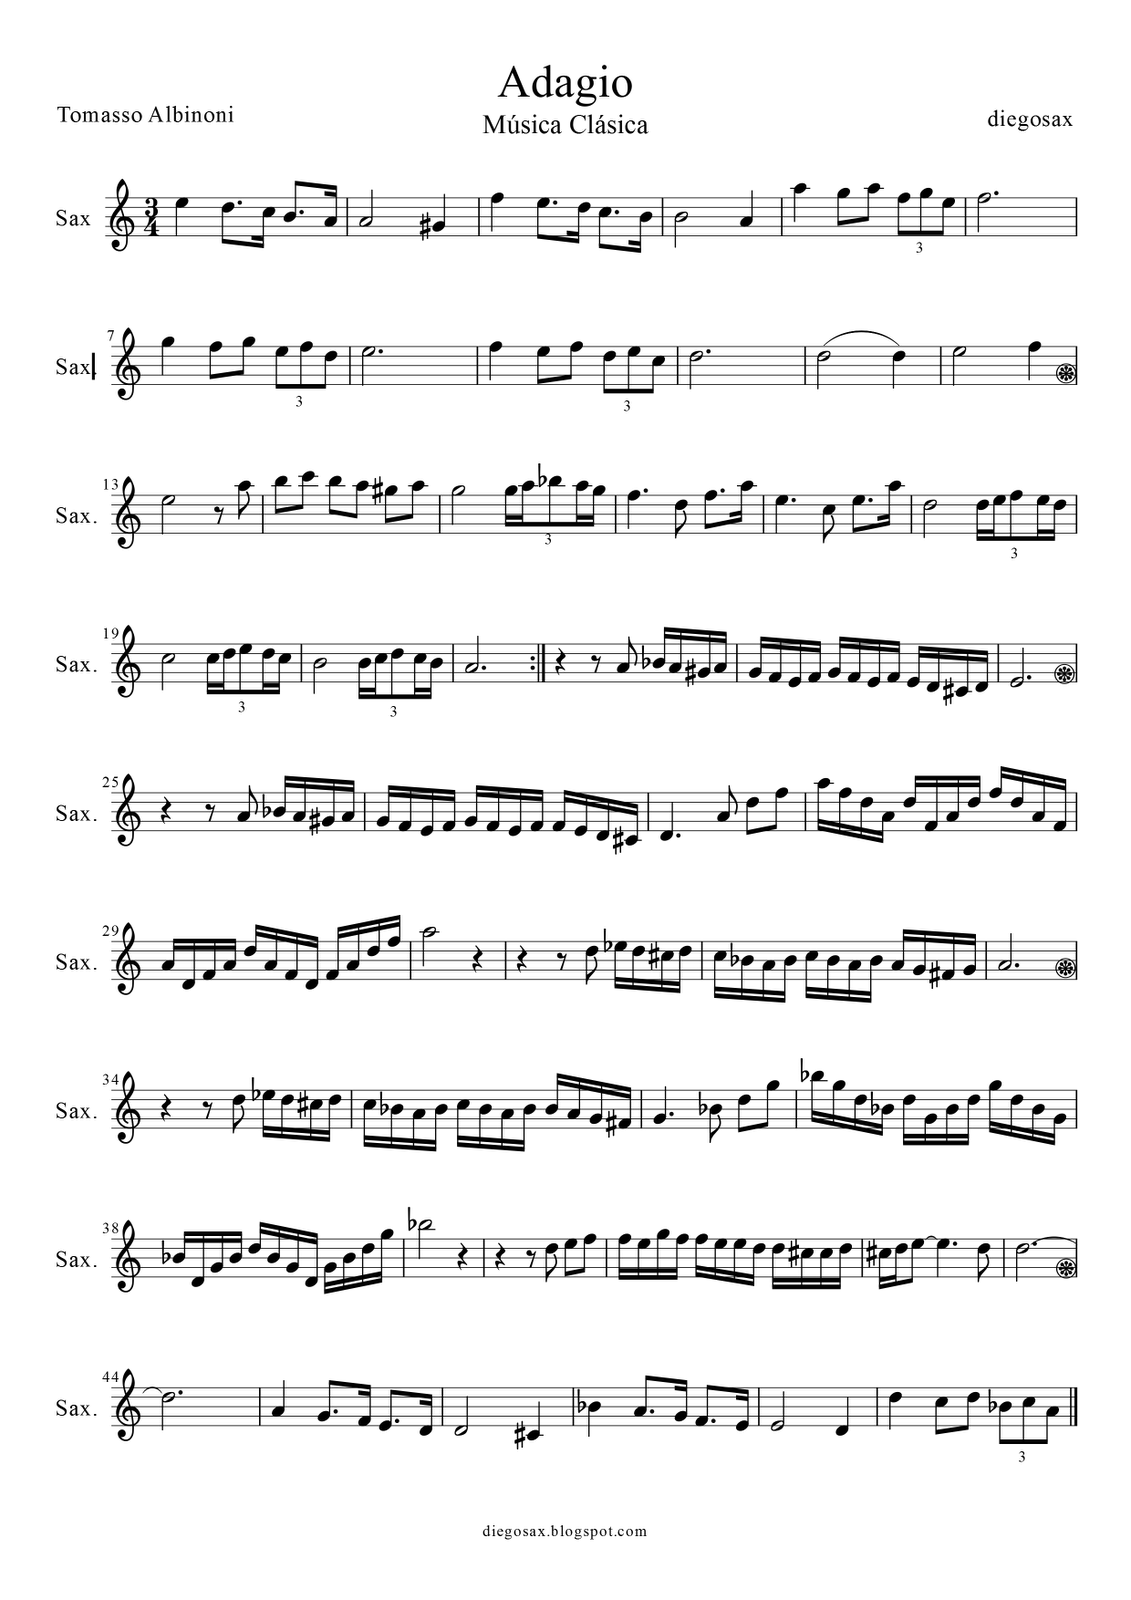 Adagio+Hoja+1+Saxof%C3%B3n-1.png (1131×1600) | Kotta | Pinterest